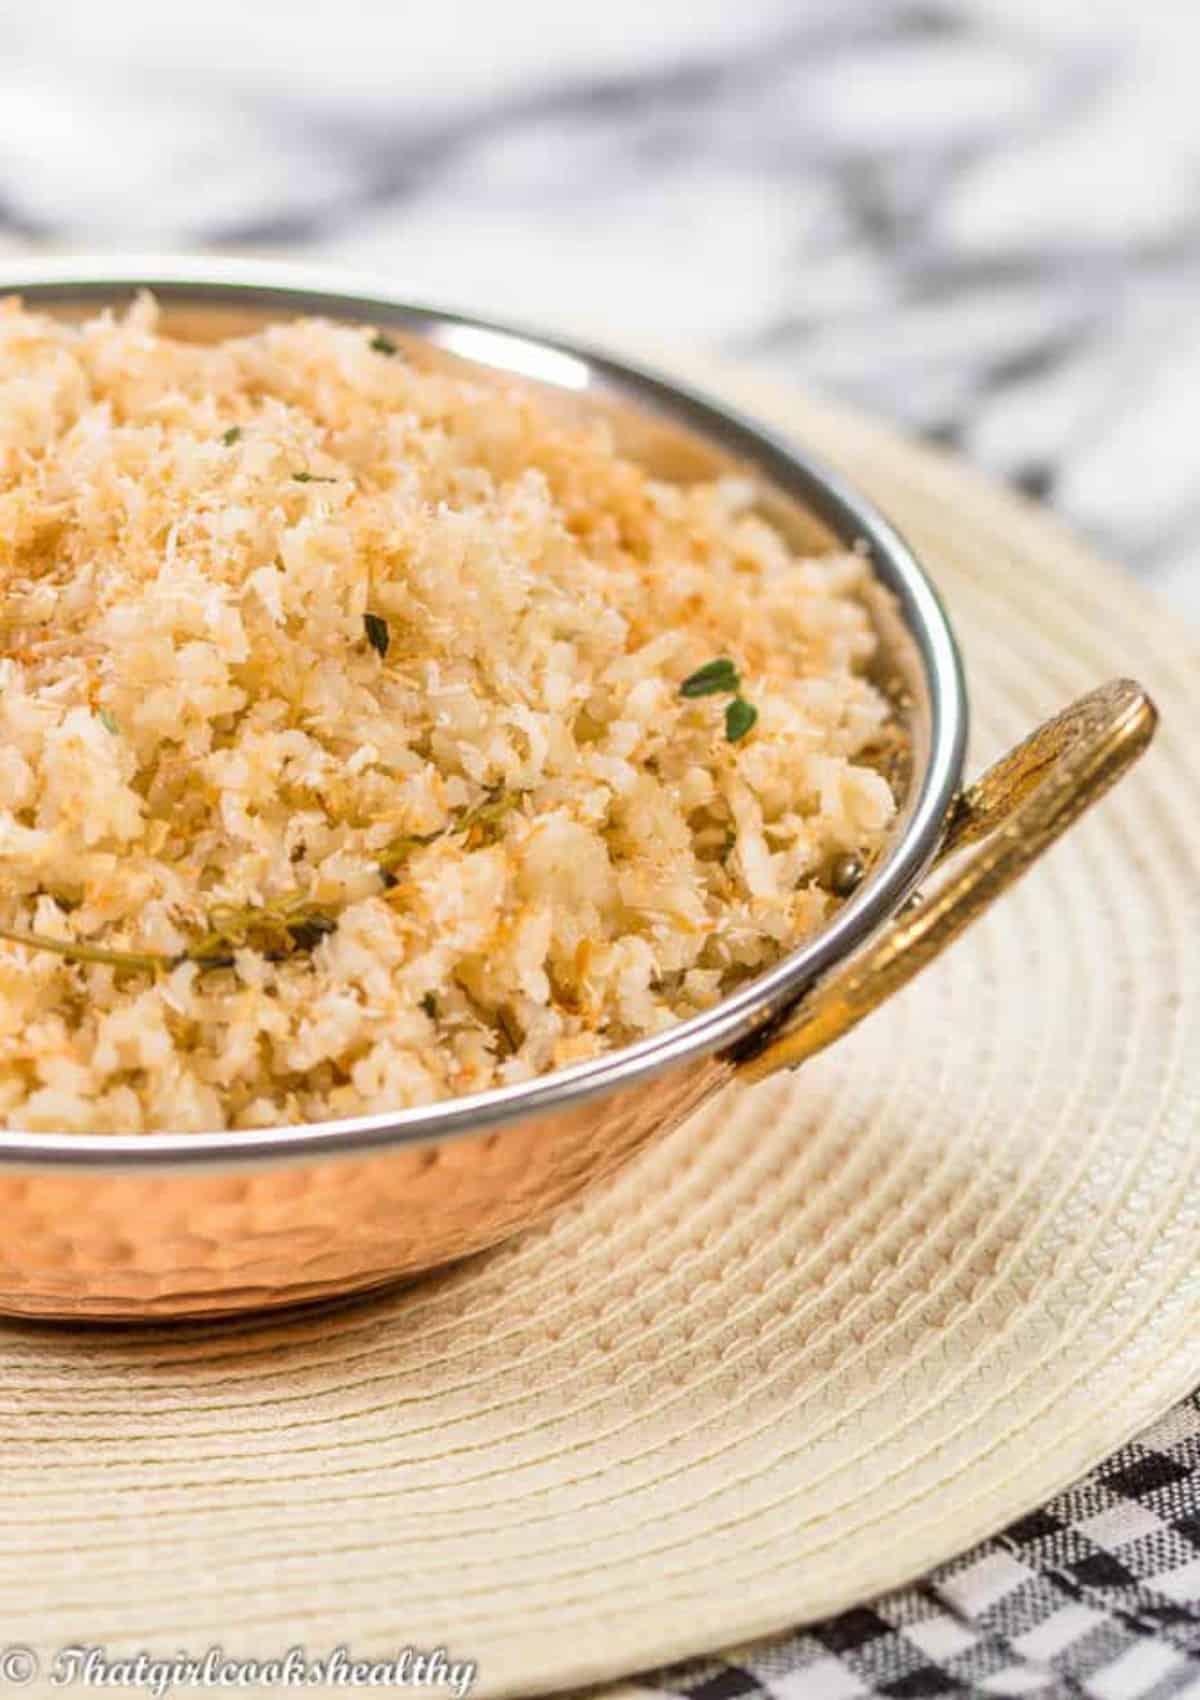 half a rice bowl